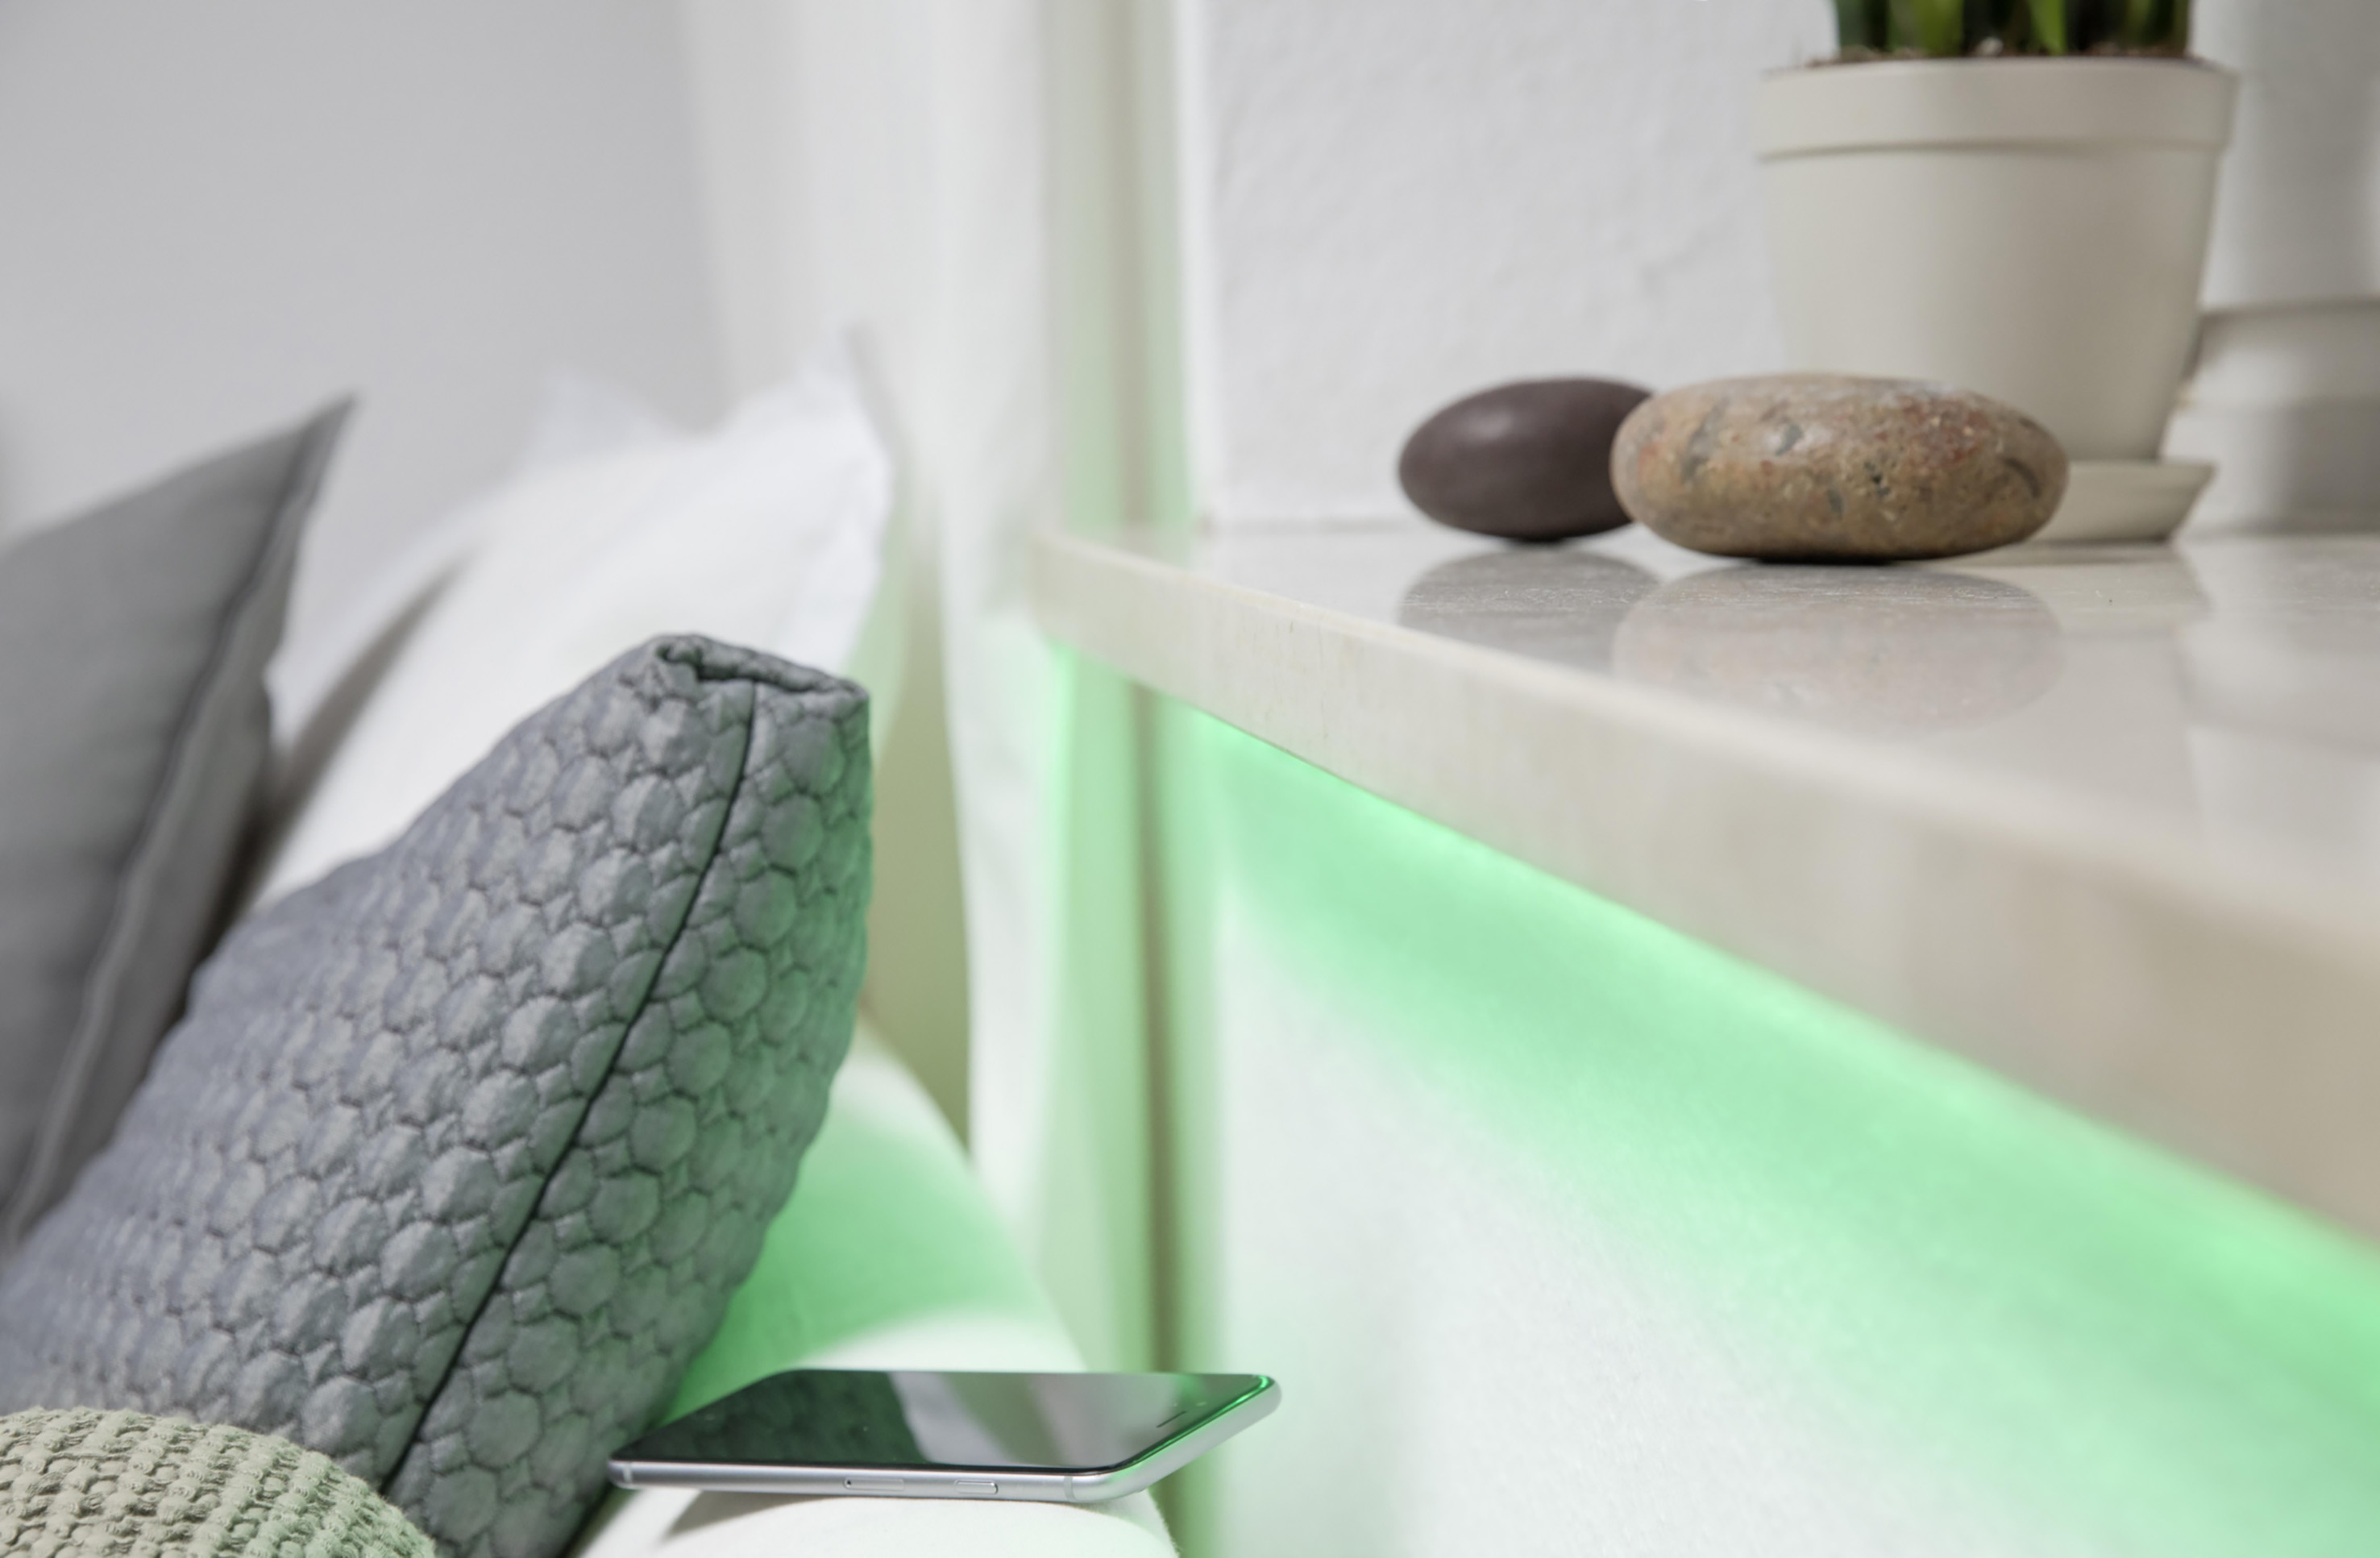 Sistemi Di Illuminazione A Led tanti sistemi smart home, una sola fonte di luce: smart+ di